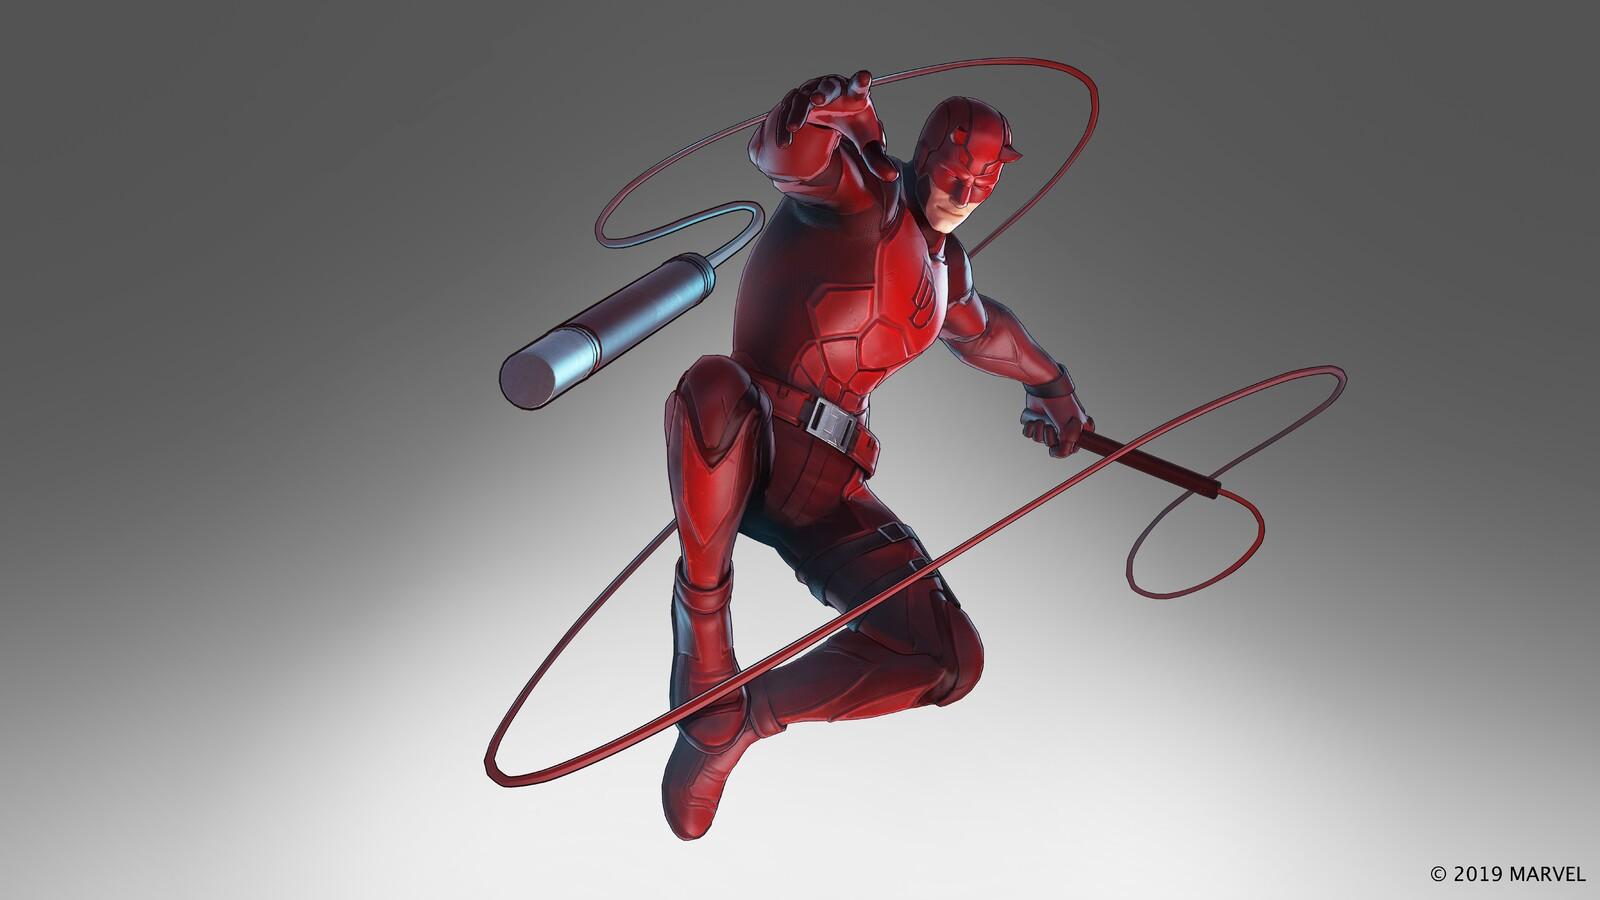 marvel-ultimate-alliance-3-2019-daredevil-8r.jpg